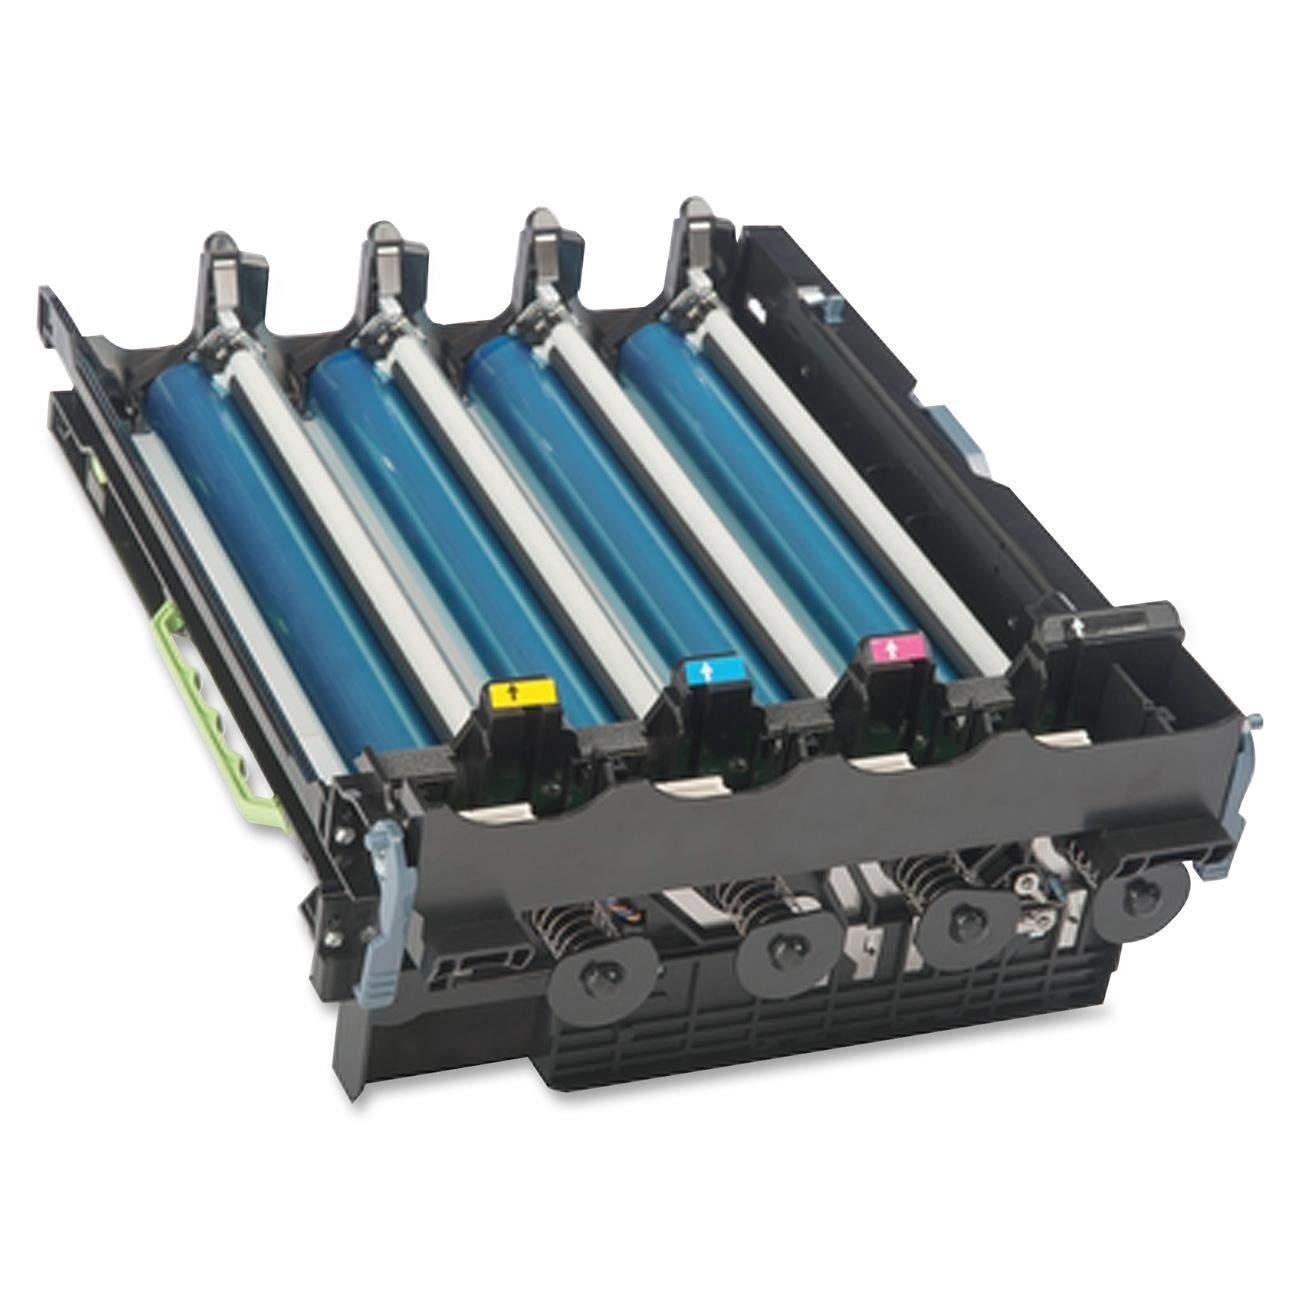 Remanufactured Photoconductor Unit (B,C,Y.M) 40K for Lexmark CS310dn CS310n CS410dn CS410dtn CS410n CS510de CS510dte CX310dn CX310n CX410de CX410dte CX410e CX510de CX510dhecs317n printer